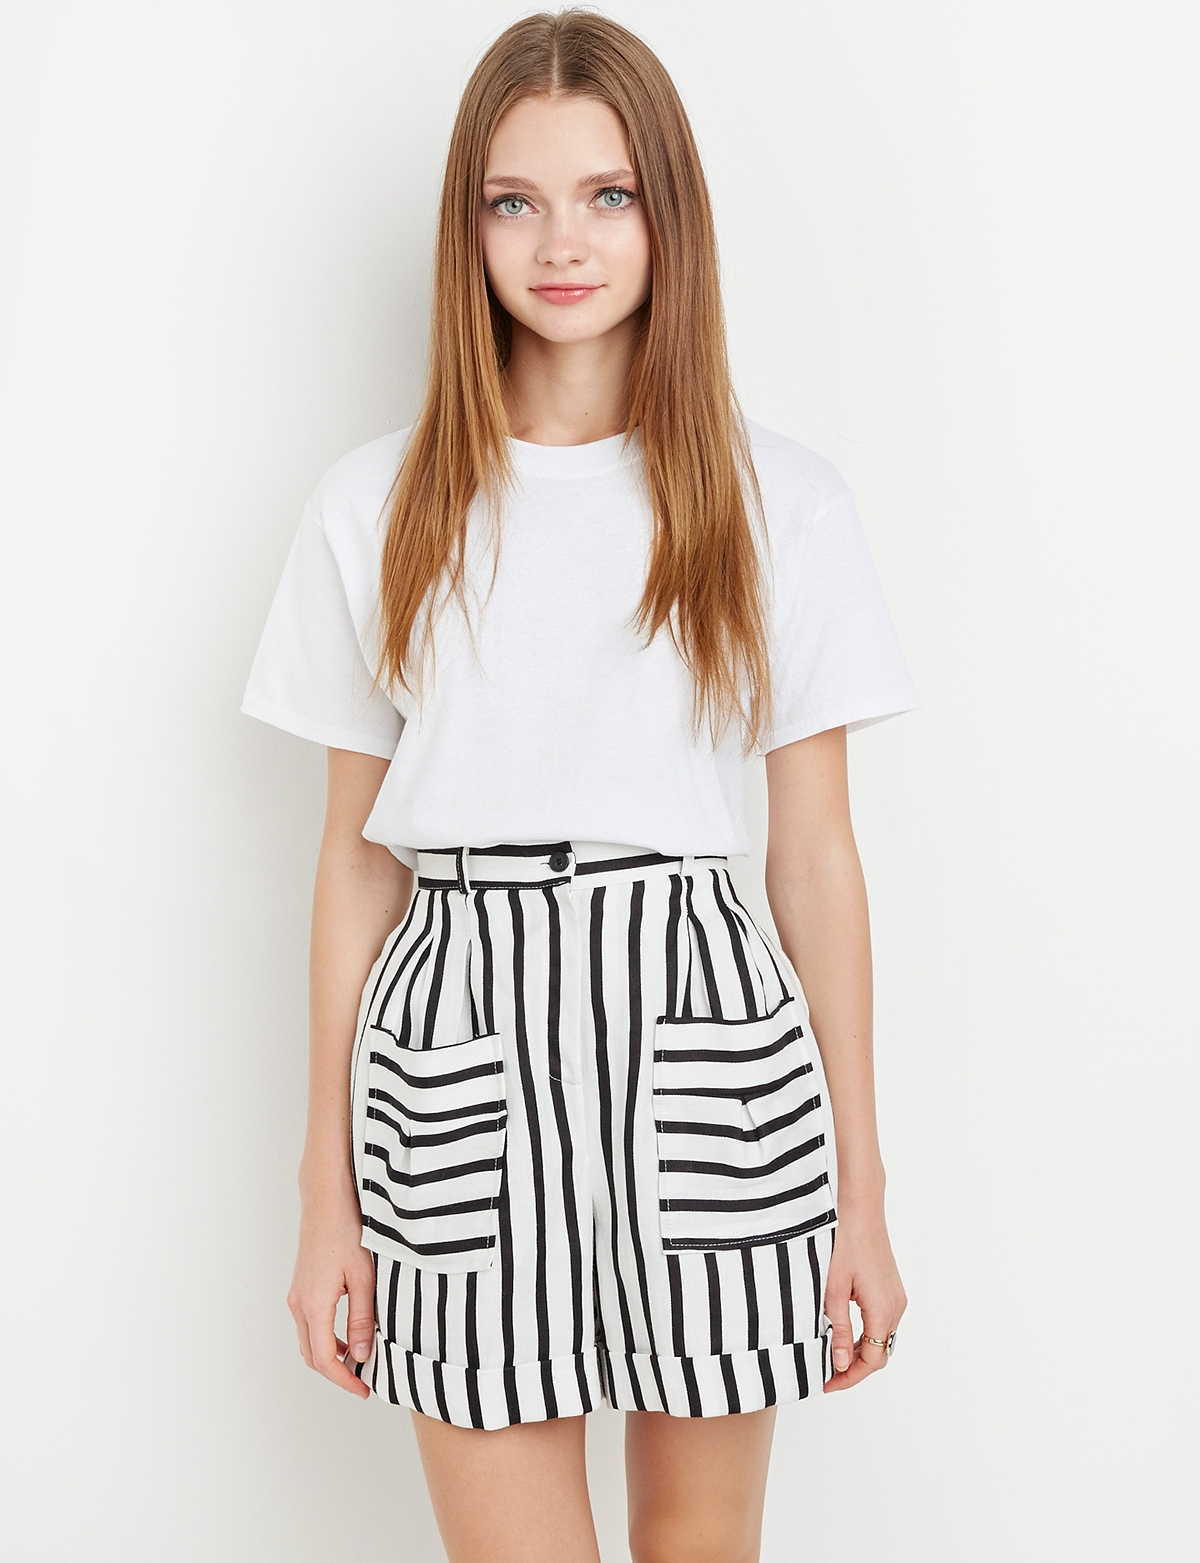 High Waisted Shorts - Black And White Shorts -